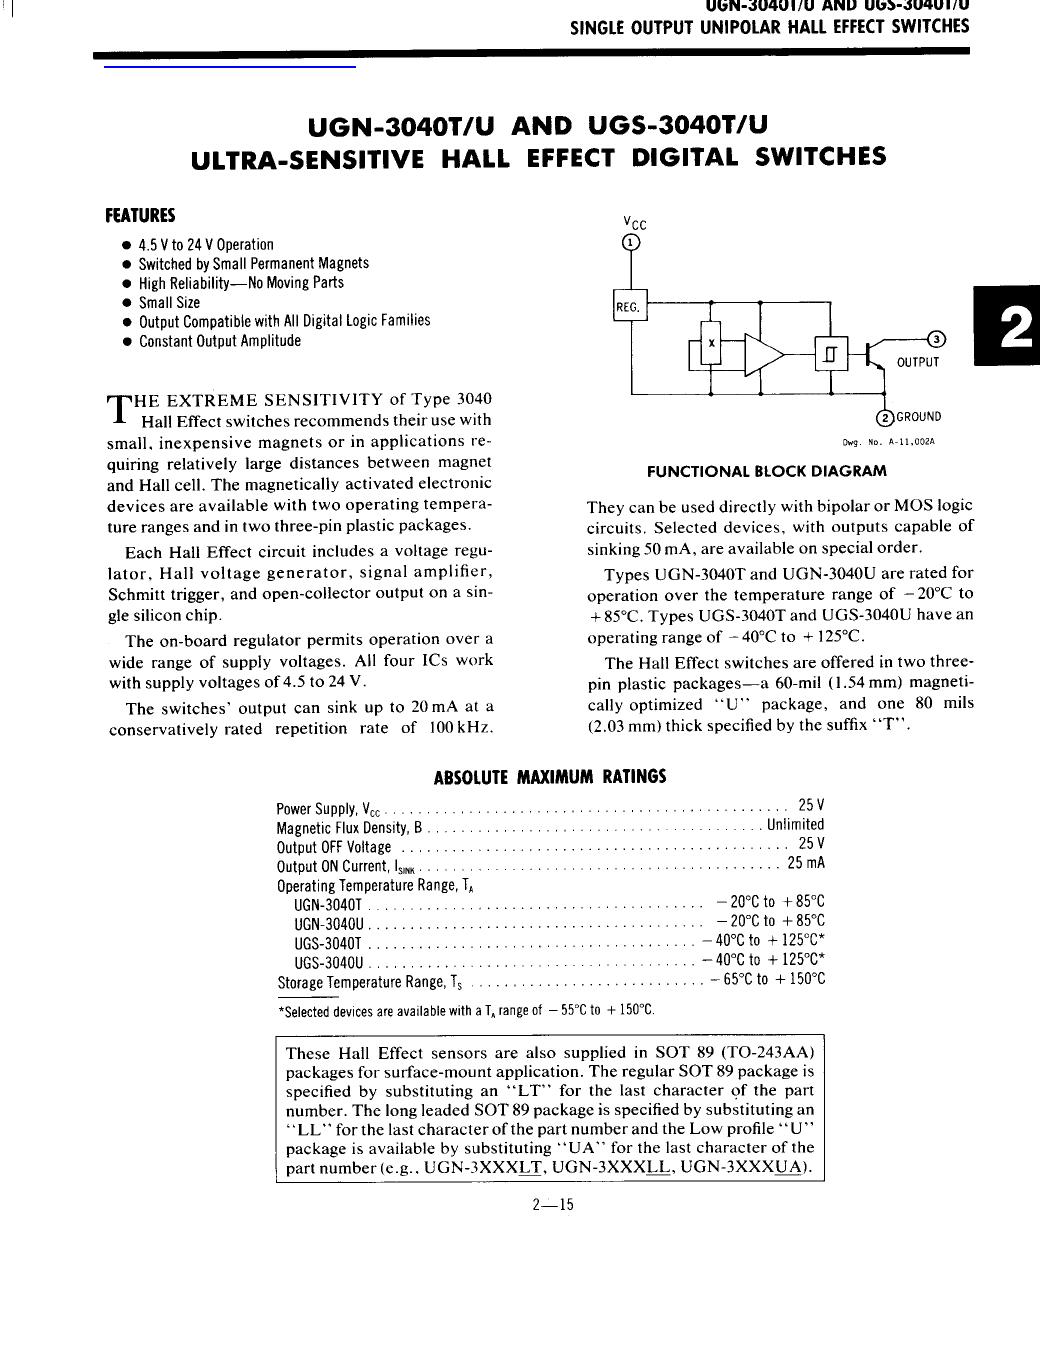 UGN-3040U دیتاشیت PDF